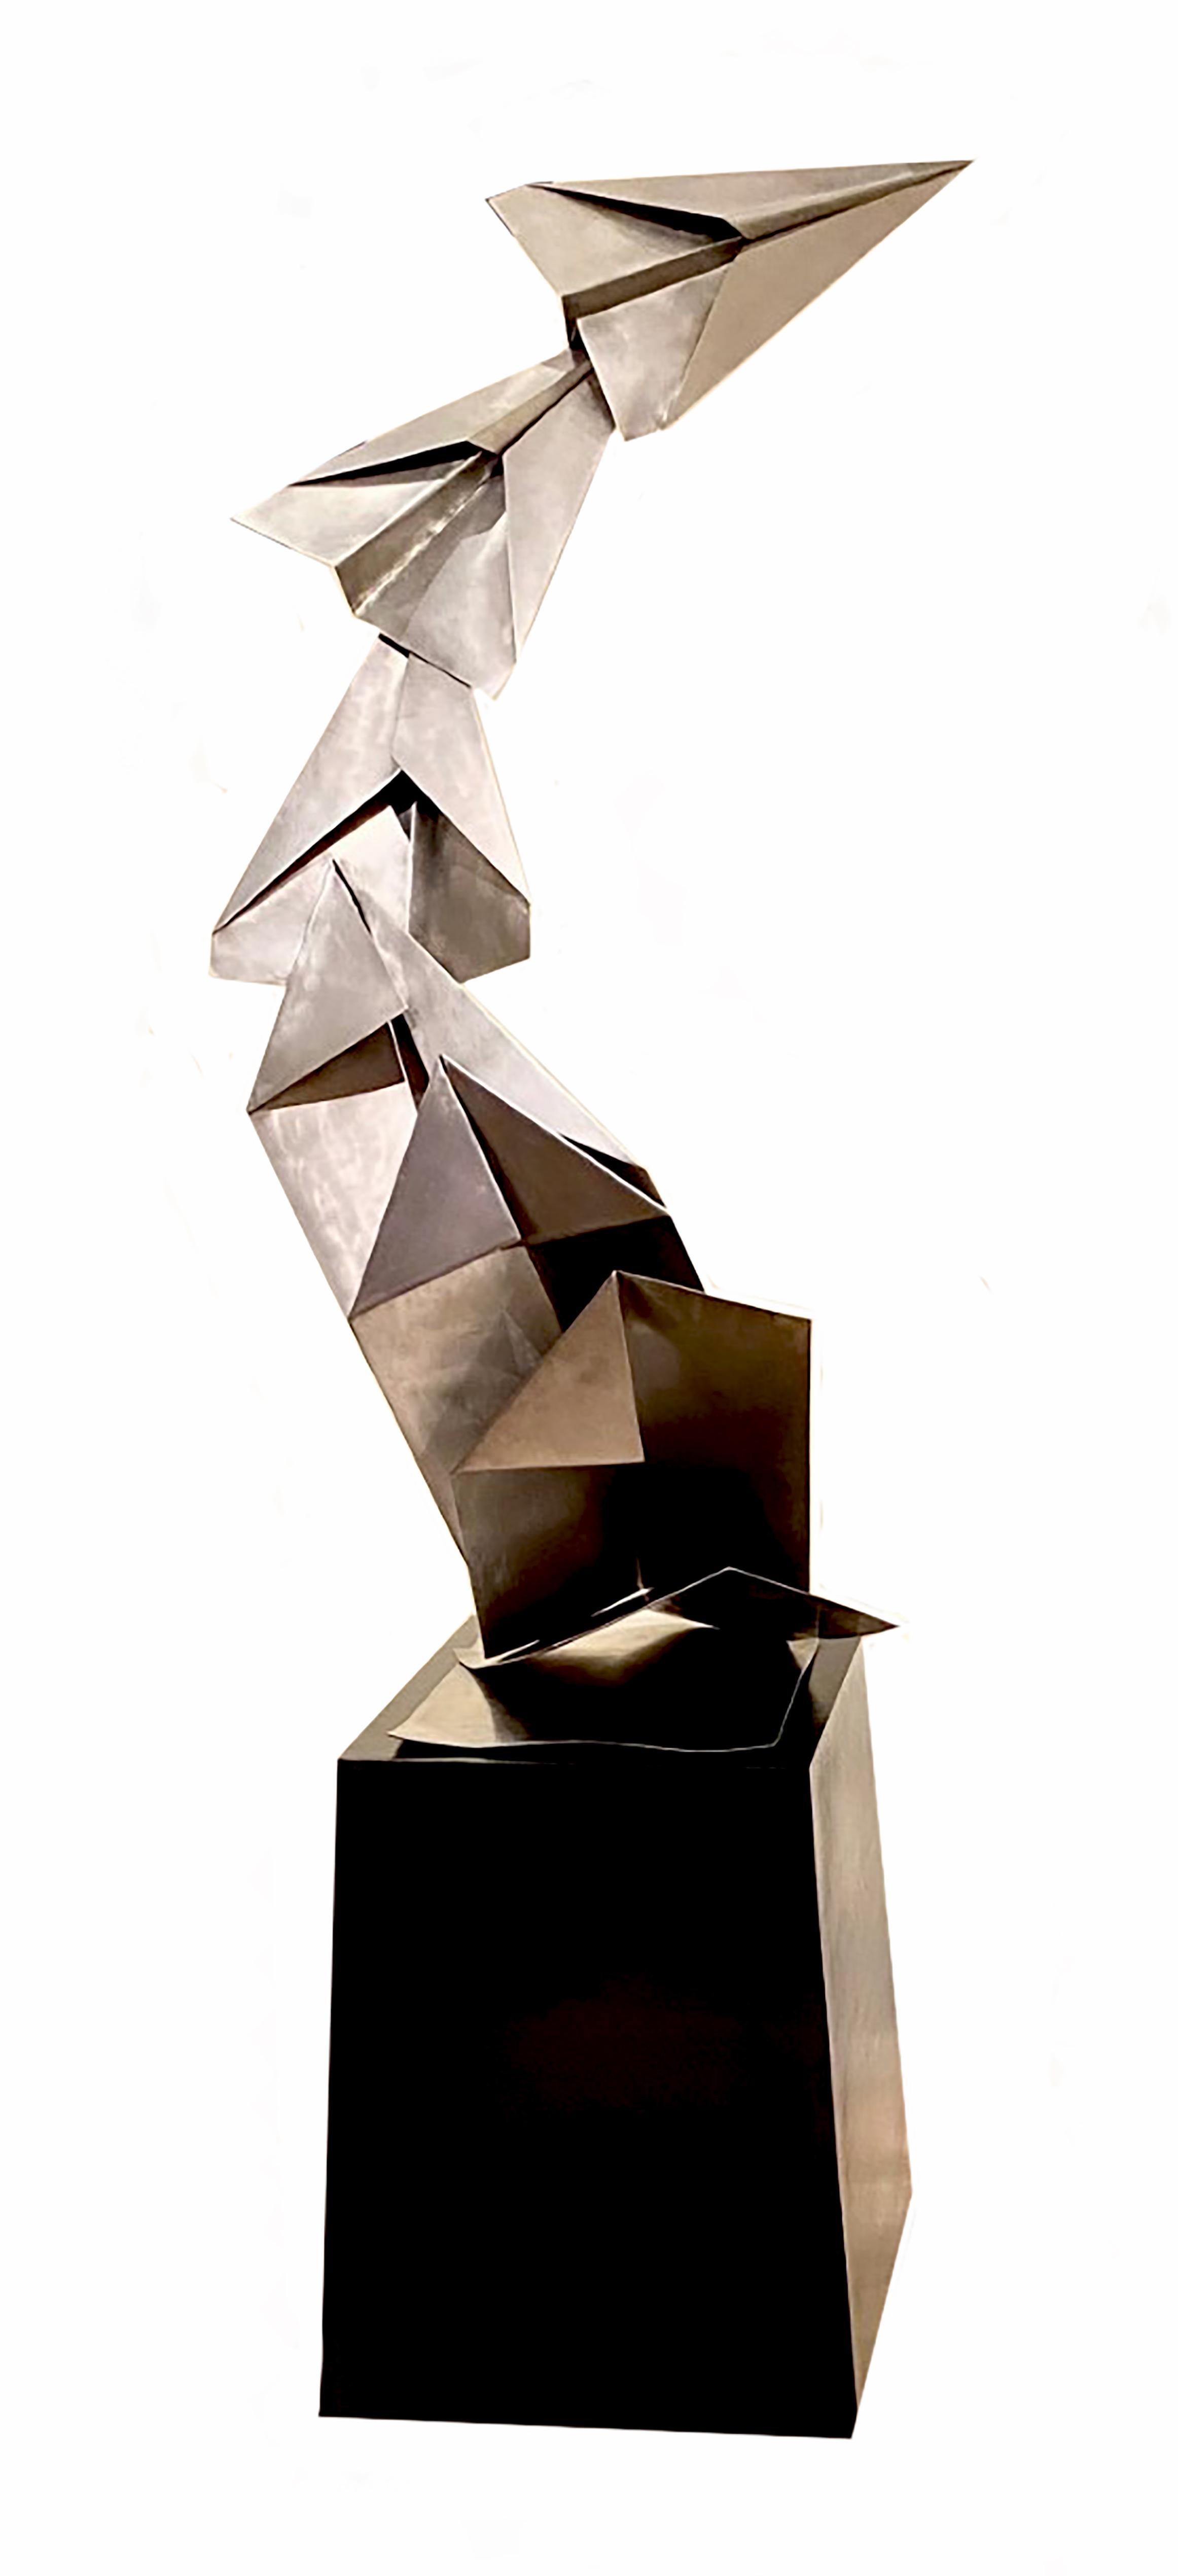 """Unfolding the Magic"" Kevin Box Folding Planes Sculpture"